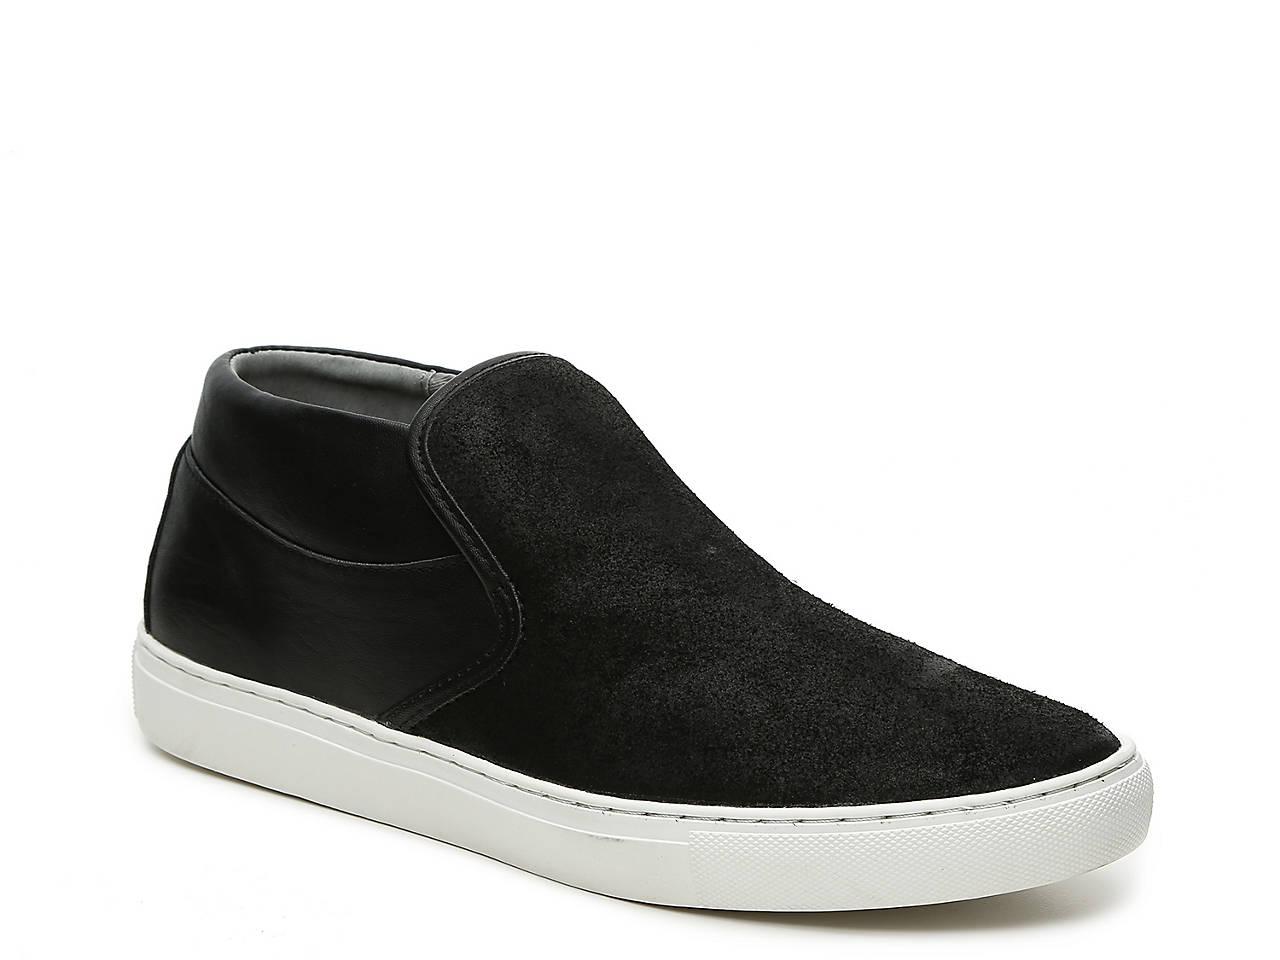 998065f52c03 TCG Venice Slip-On Sneaker Men's Shoes | DSW